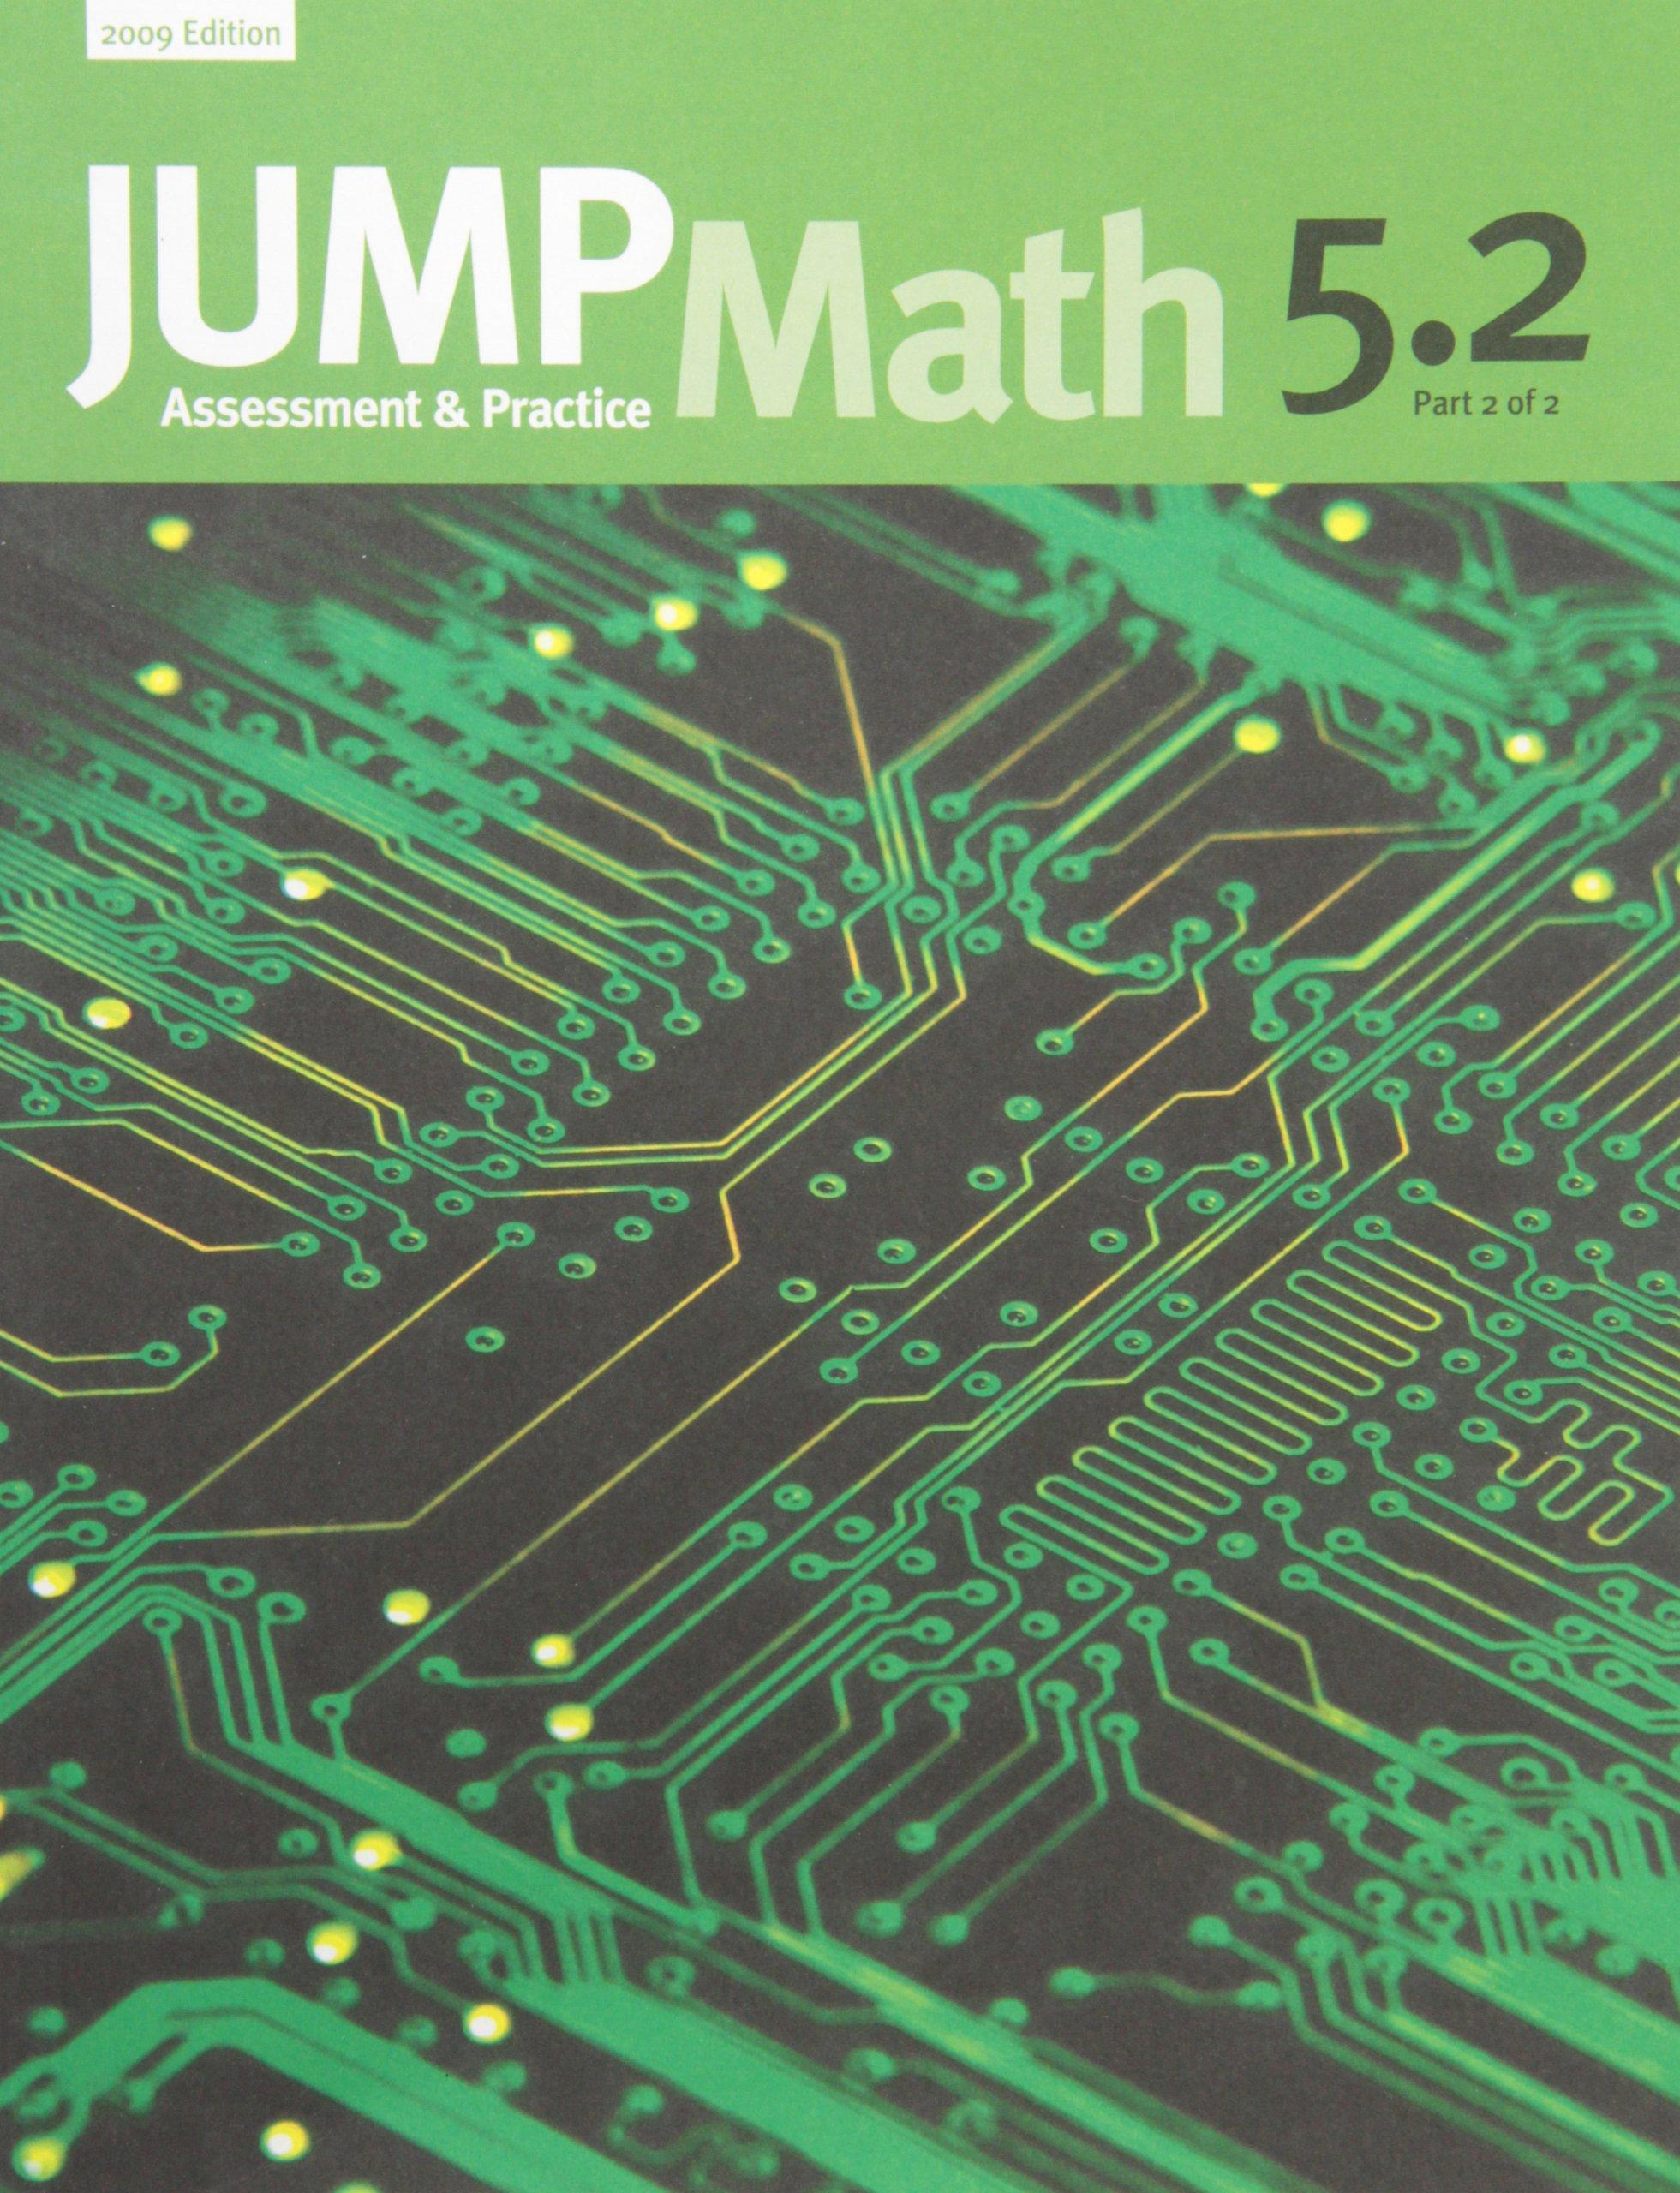 JUMP Math 5.1: Book 5, Part 1 of 2: Amazon.ca: John Mighton, JUMP ...